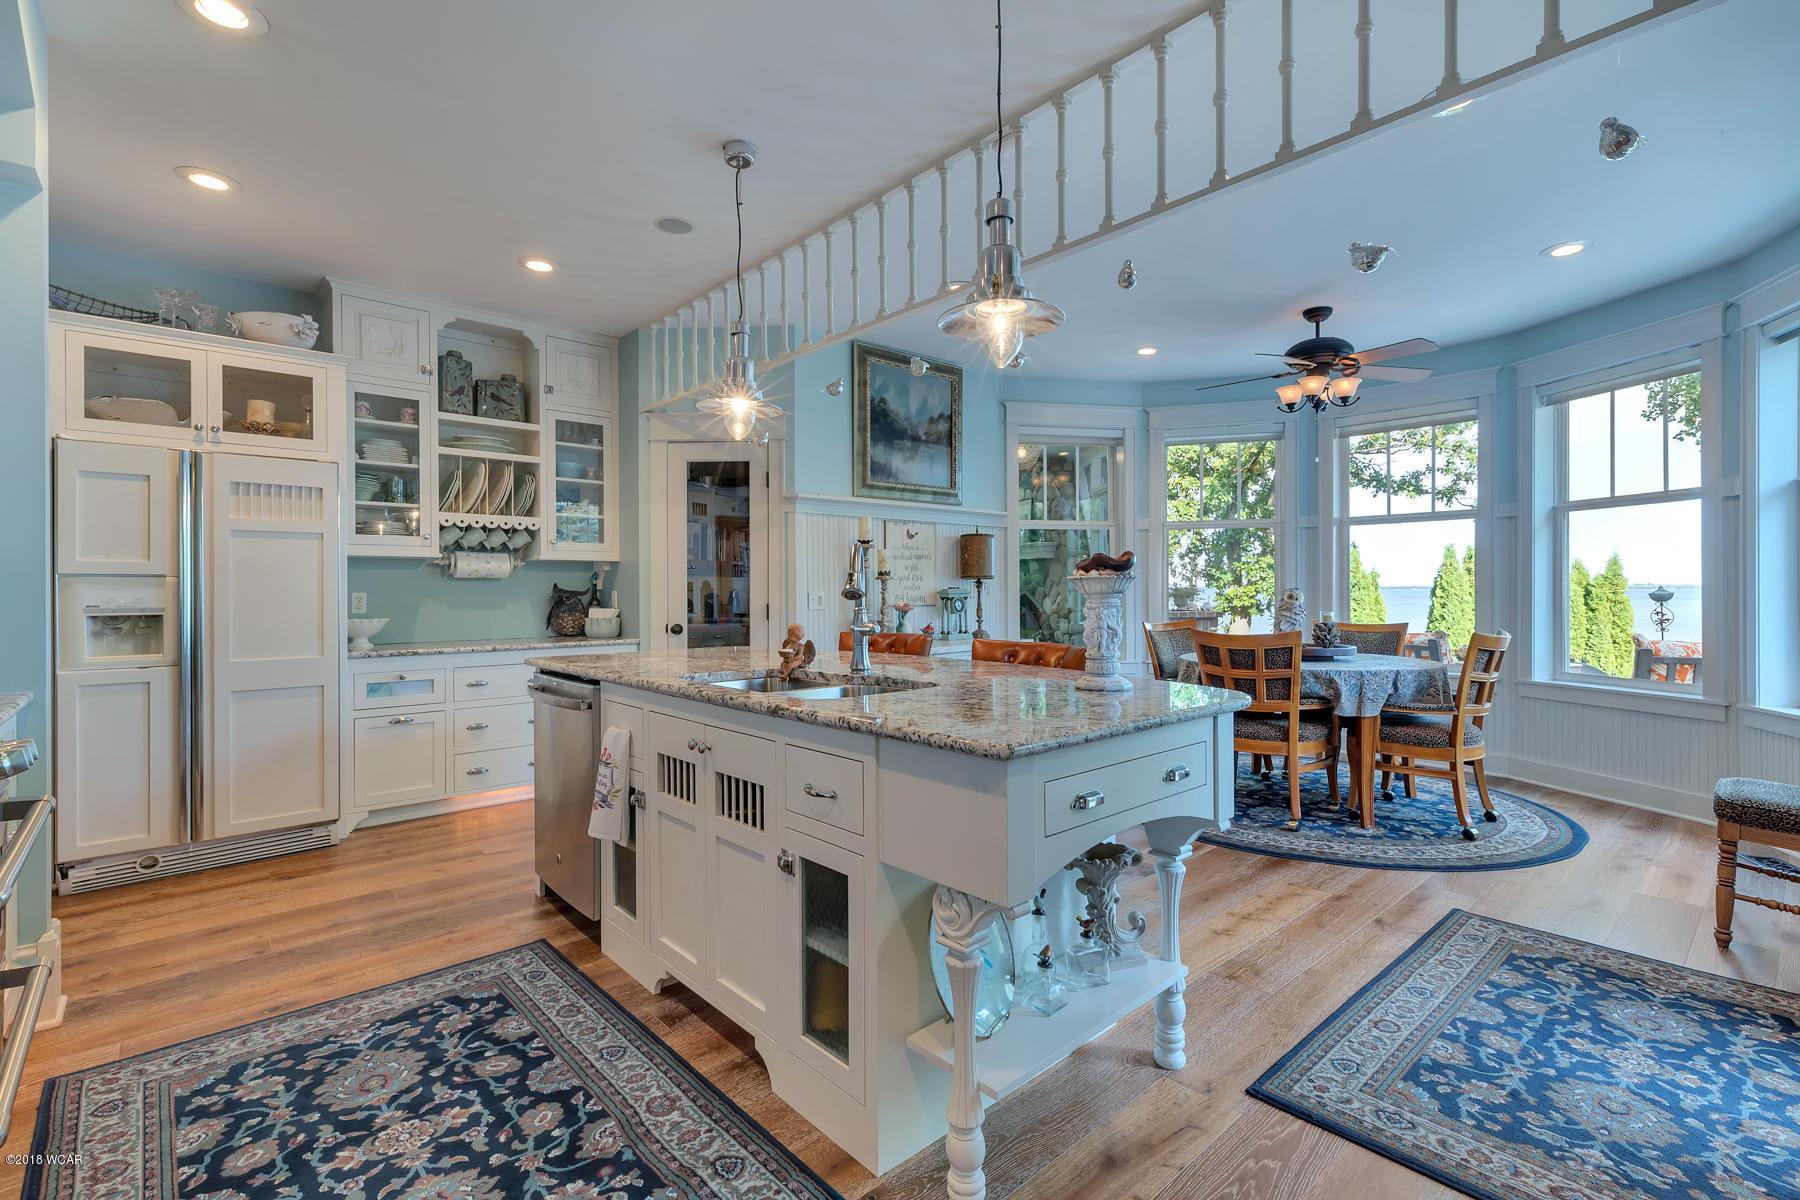 235 Lake Avenue,Spicer,4 Bedrooms Bedrooms,4 BathroomsBathrooms,Single Family,Lake Avenue,6032456